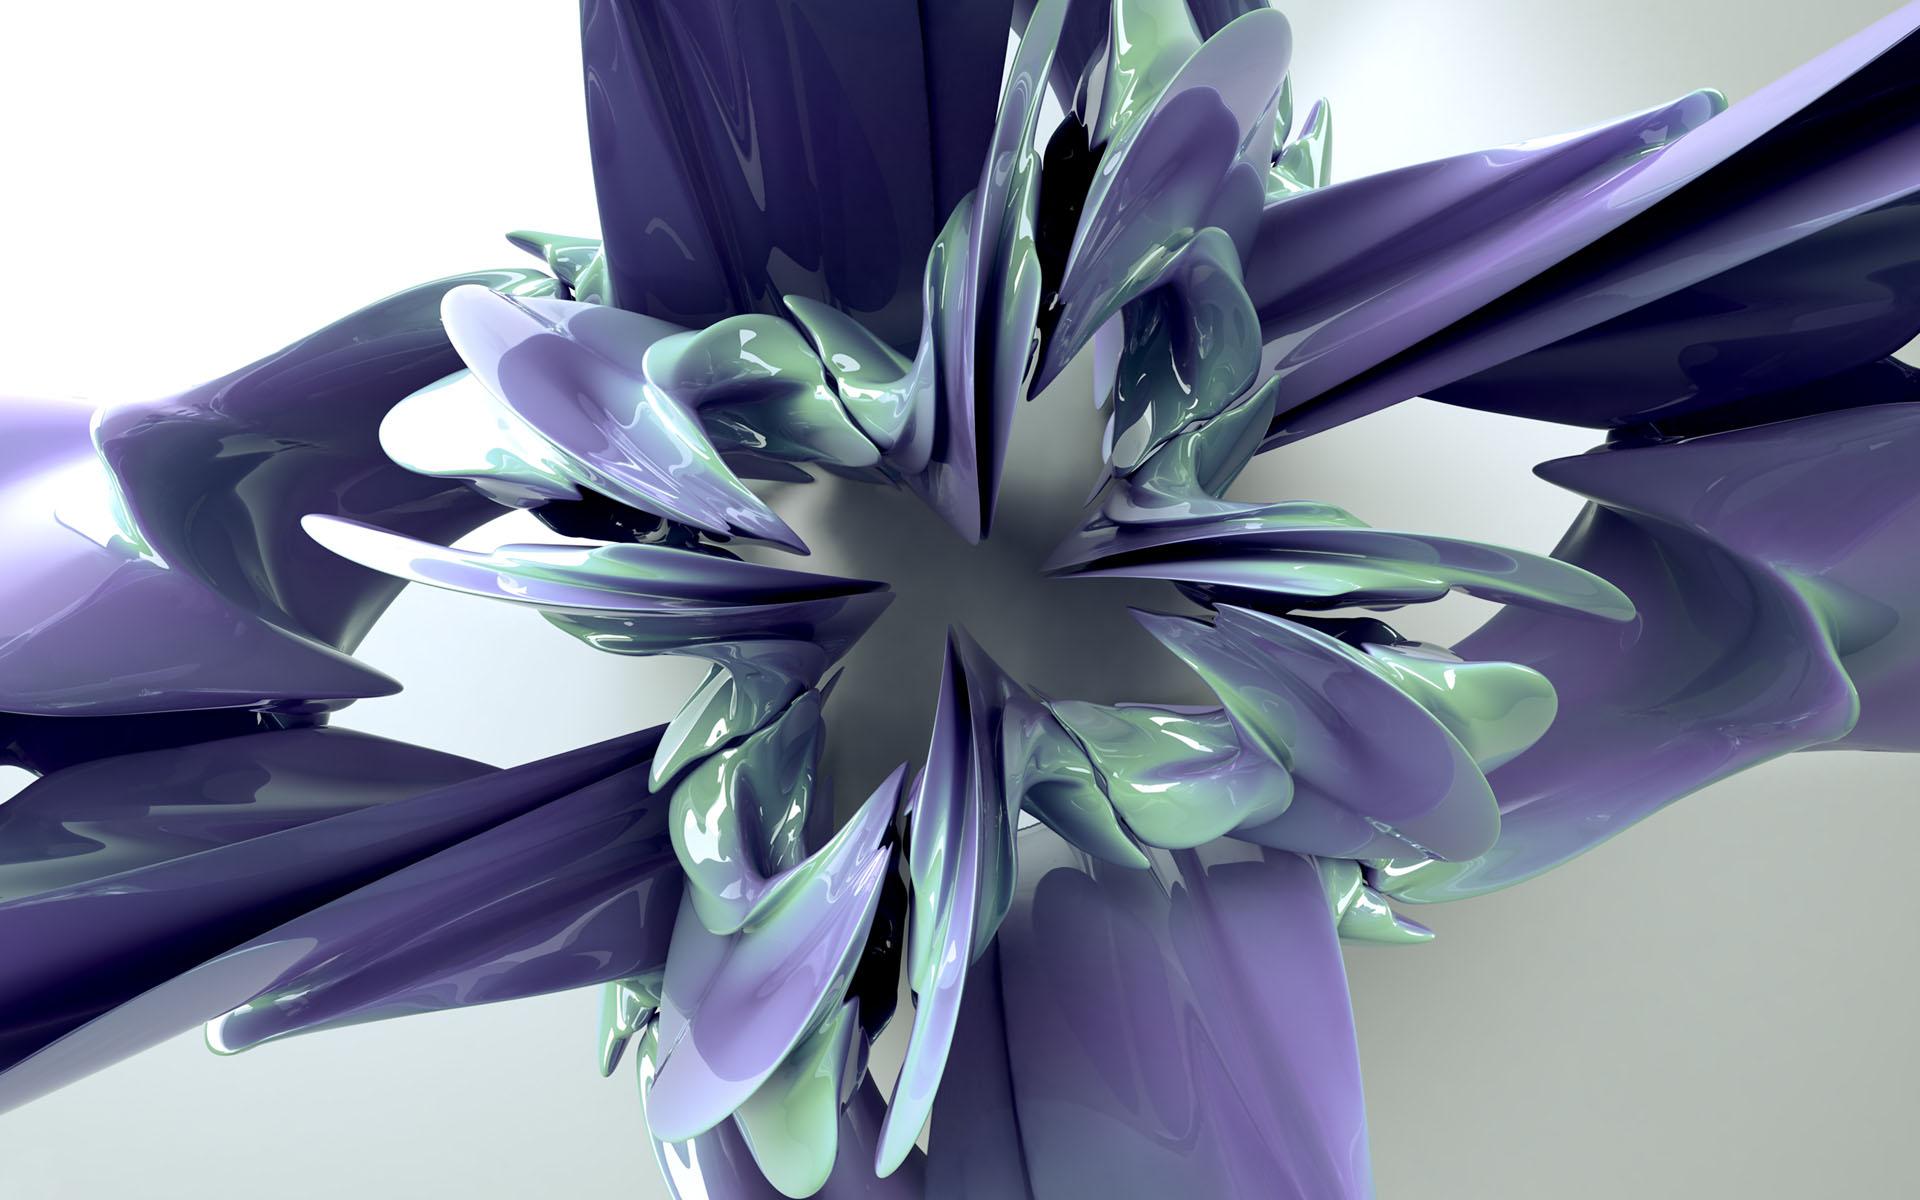 3d abstract flower fantasy wallpaper hd desktop gallery - Flower wallpaper 3d pic ...